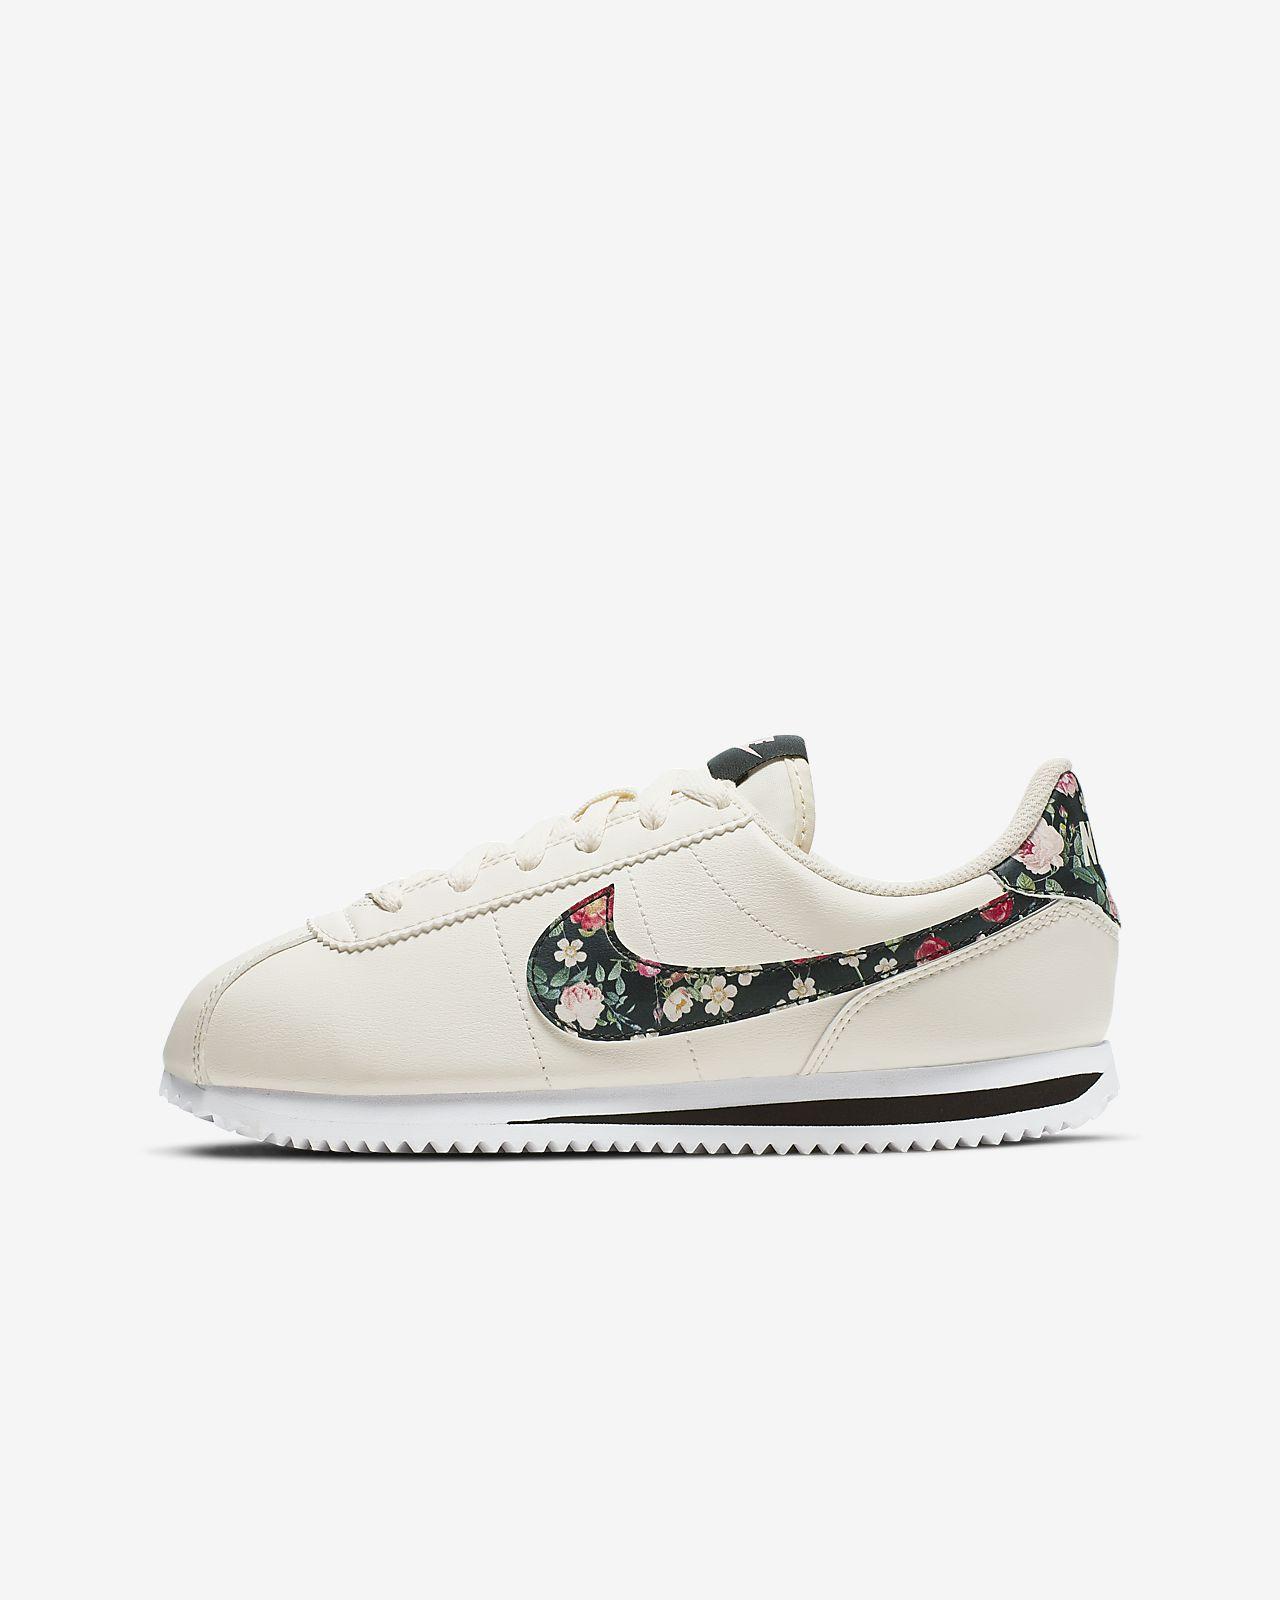 Scarpa Nike Cortez Basic Vintage Floral - Ragazzi